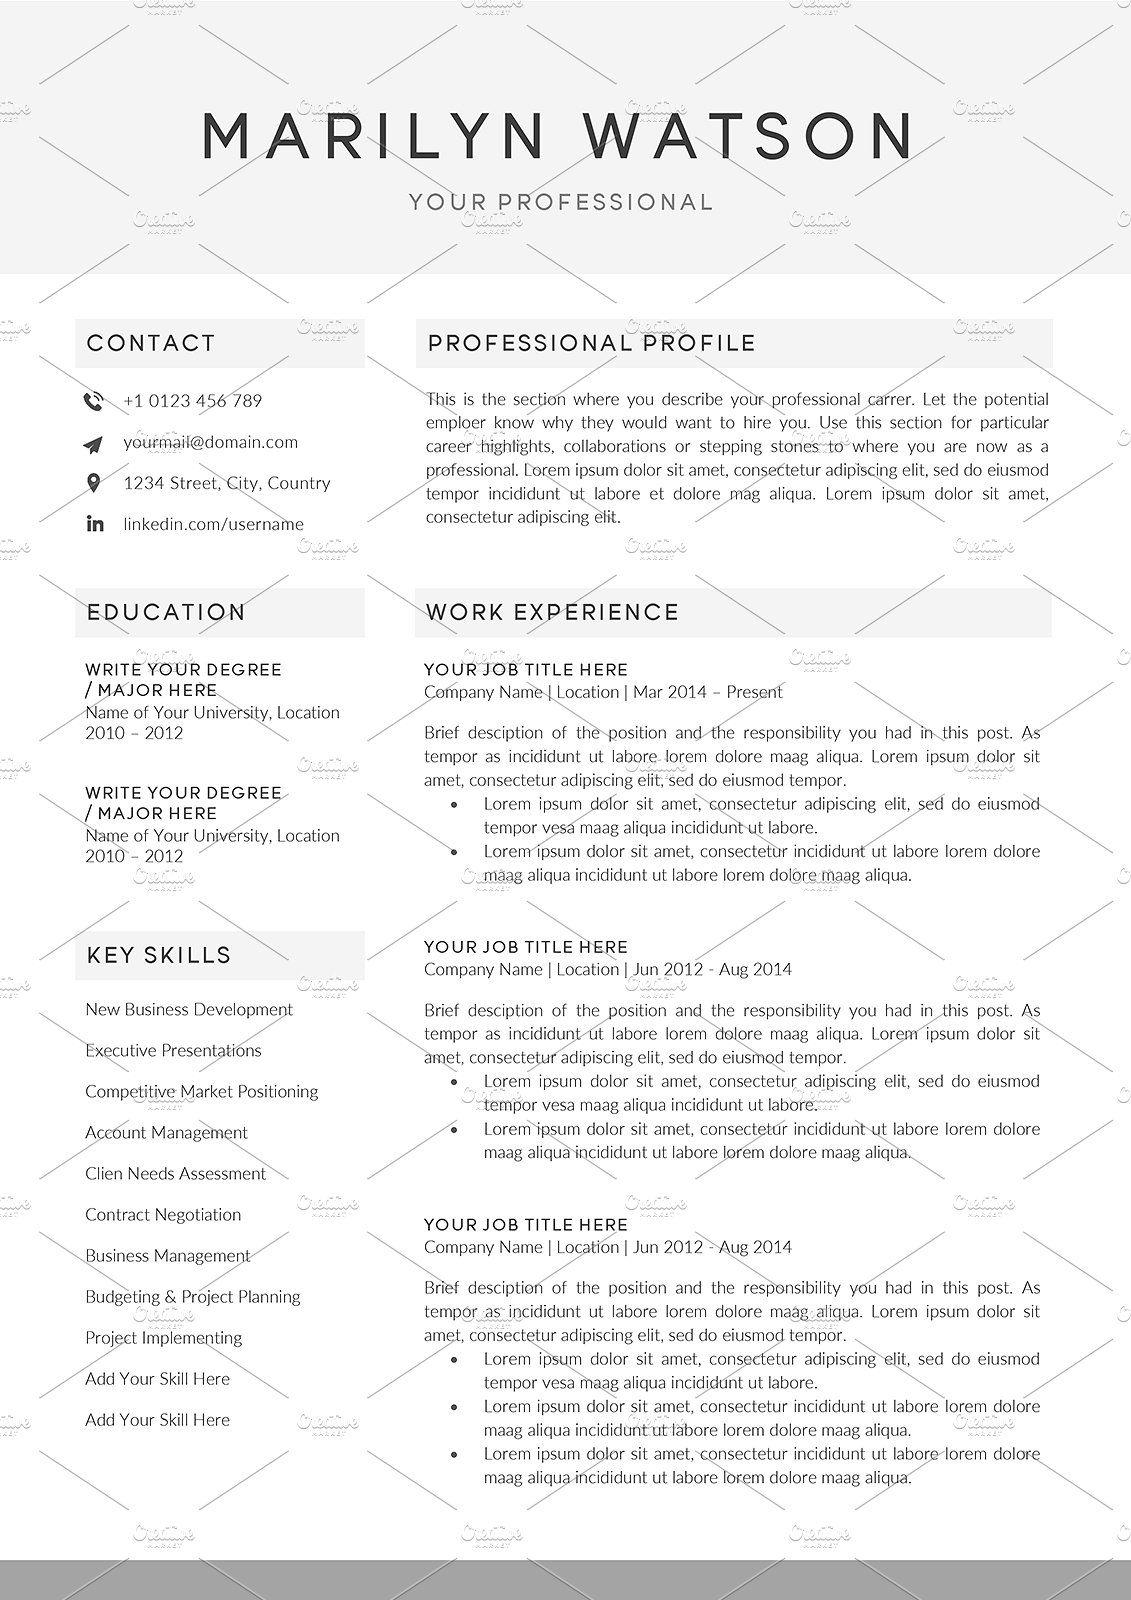 Resume Cv Mw Resume Cv Microsoft Word 2007 Word 2007